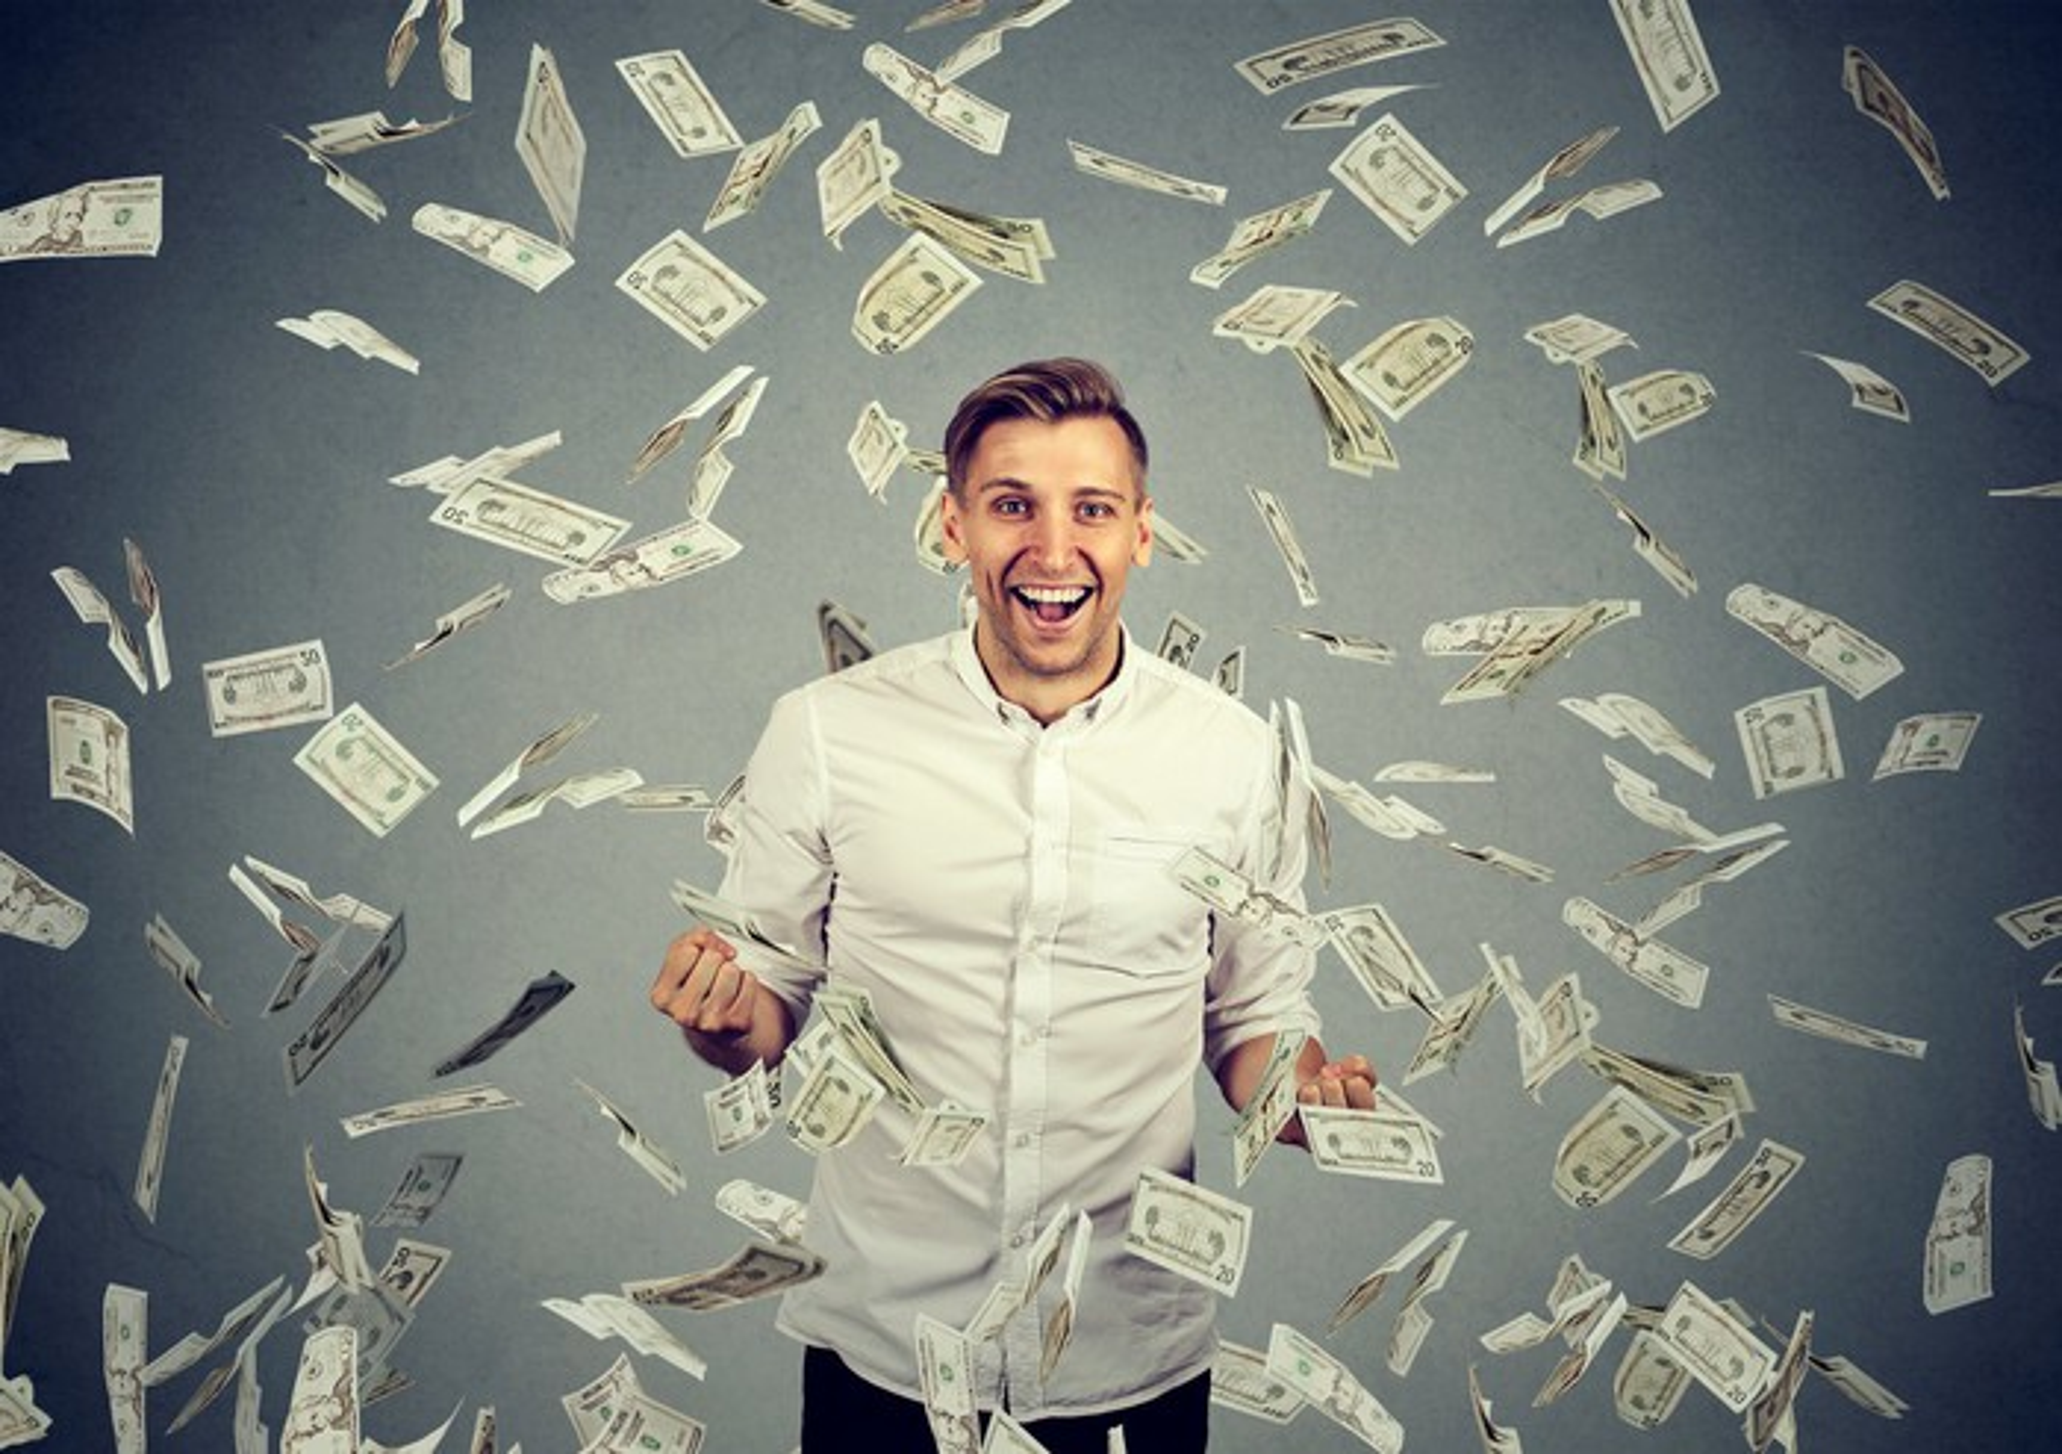 A man standing as $1 bills fall down around him.